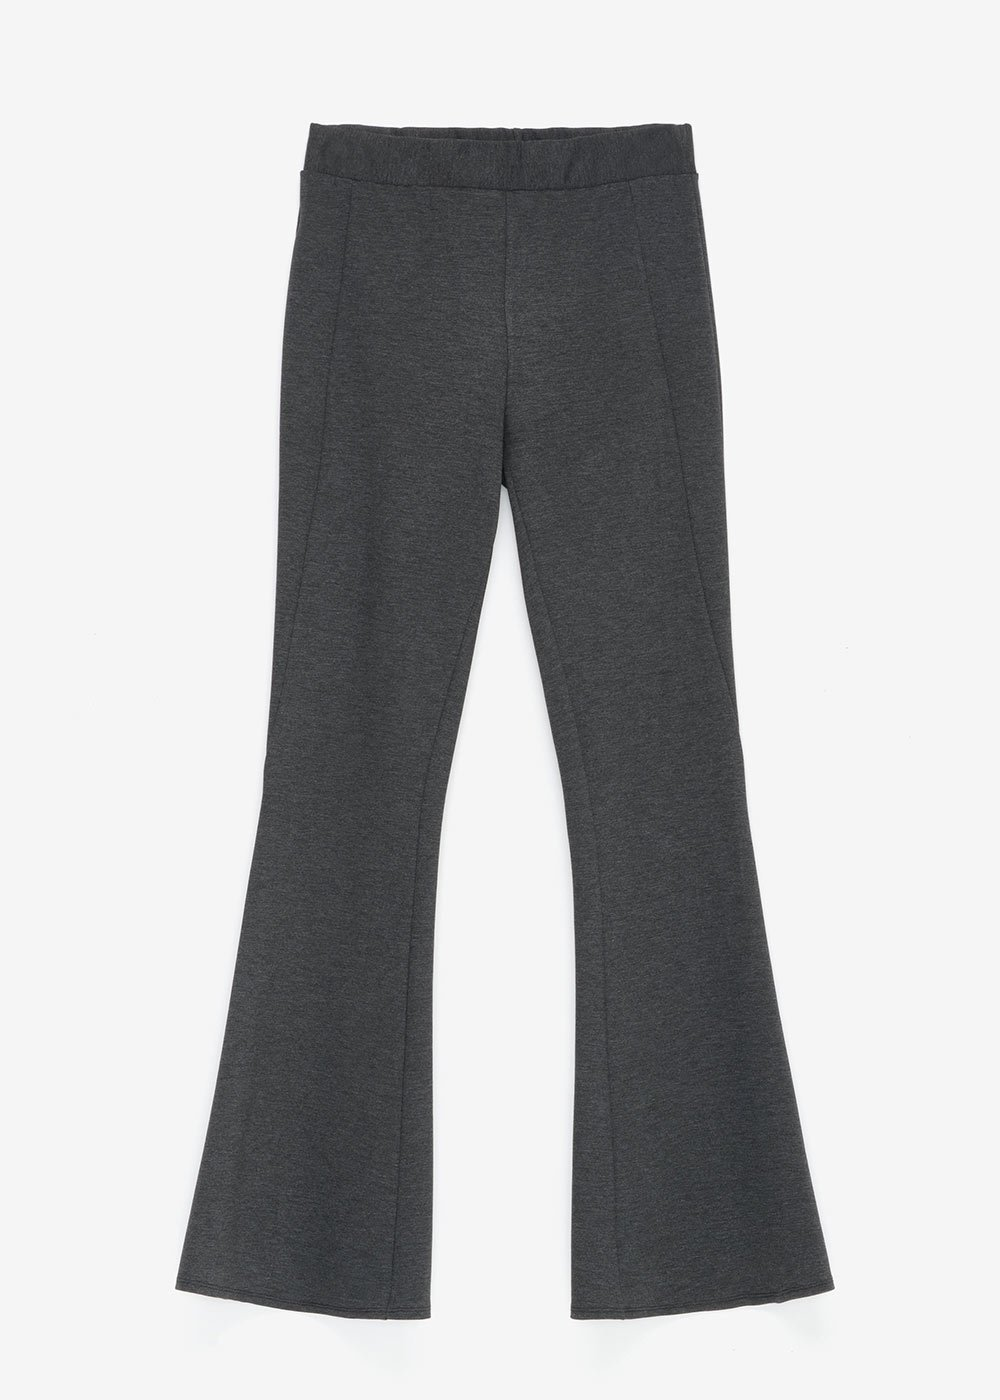 Pantalone Victoria in punto Milano - Dark Grey - Donna